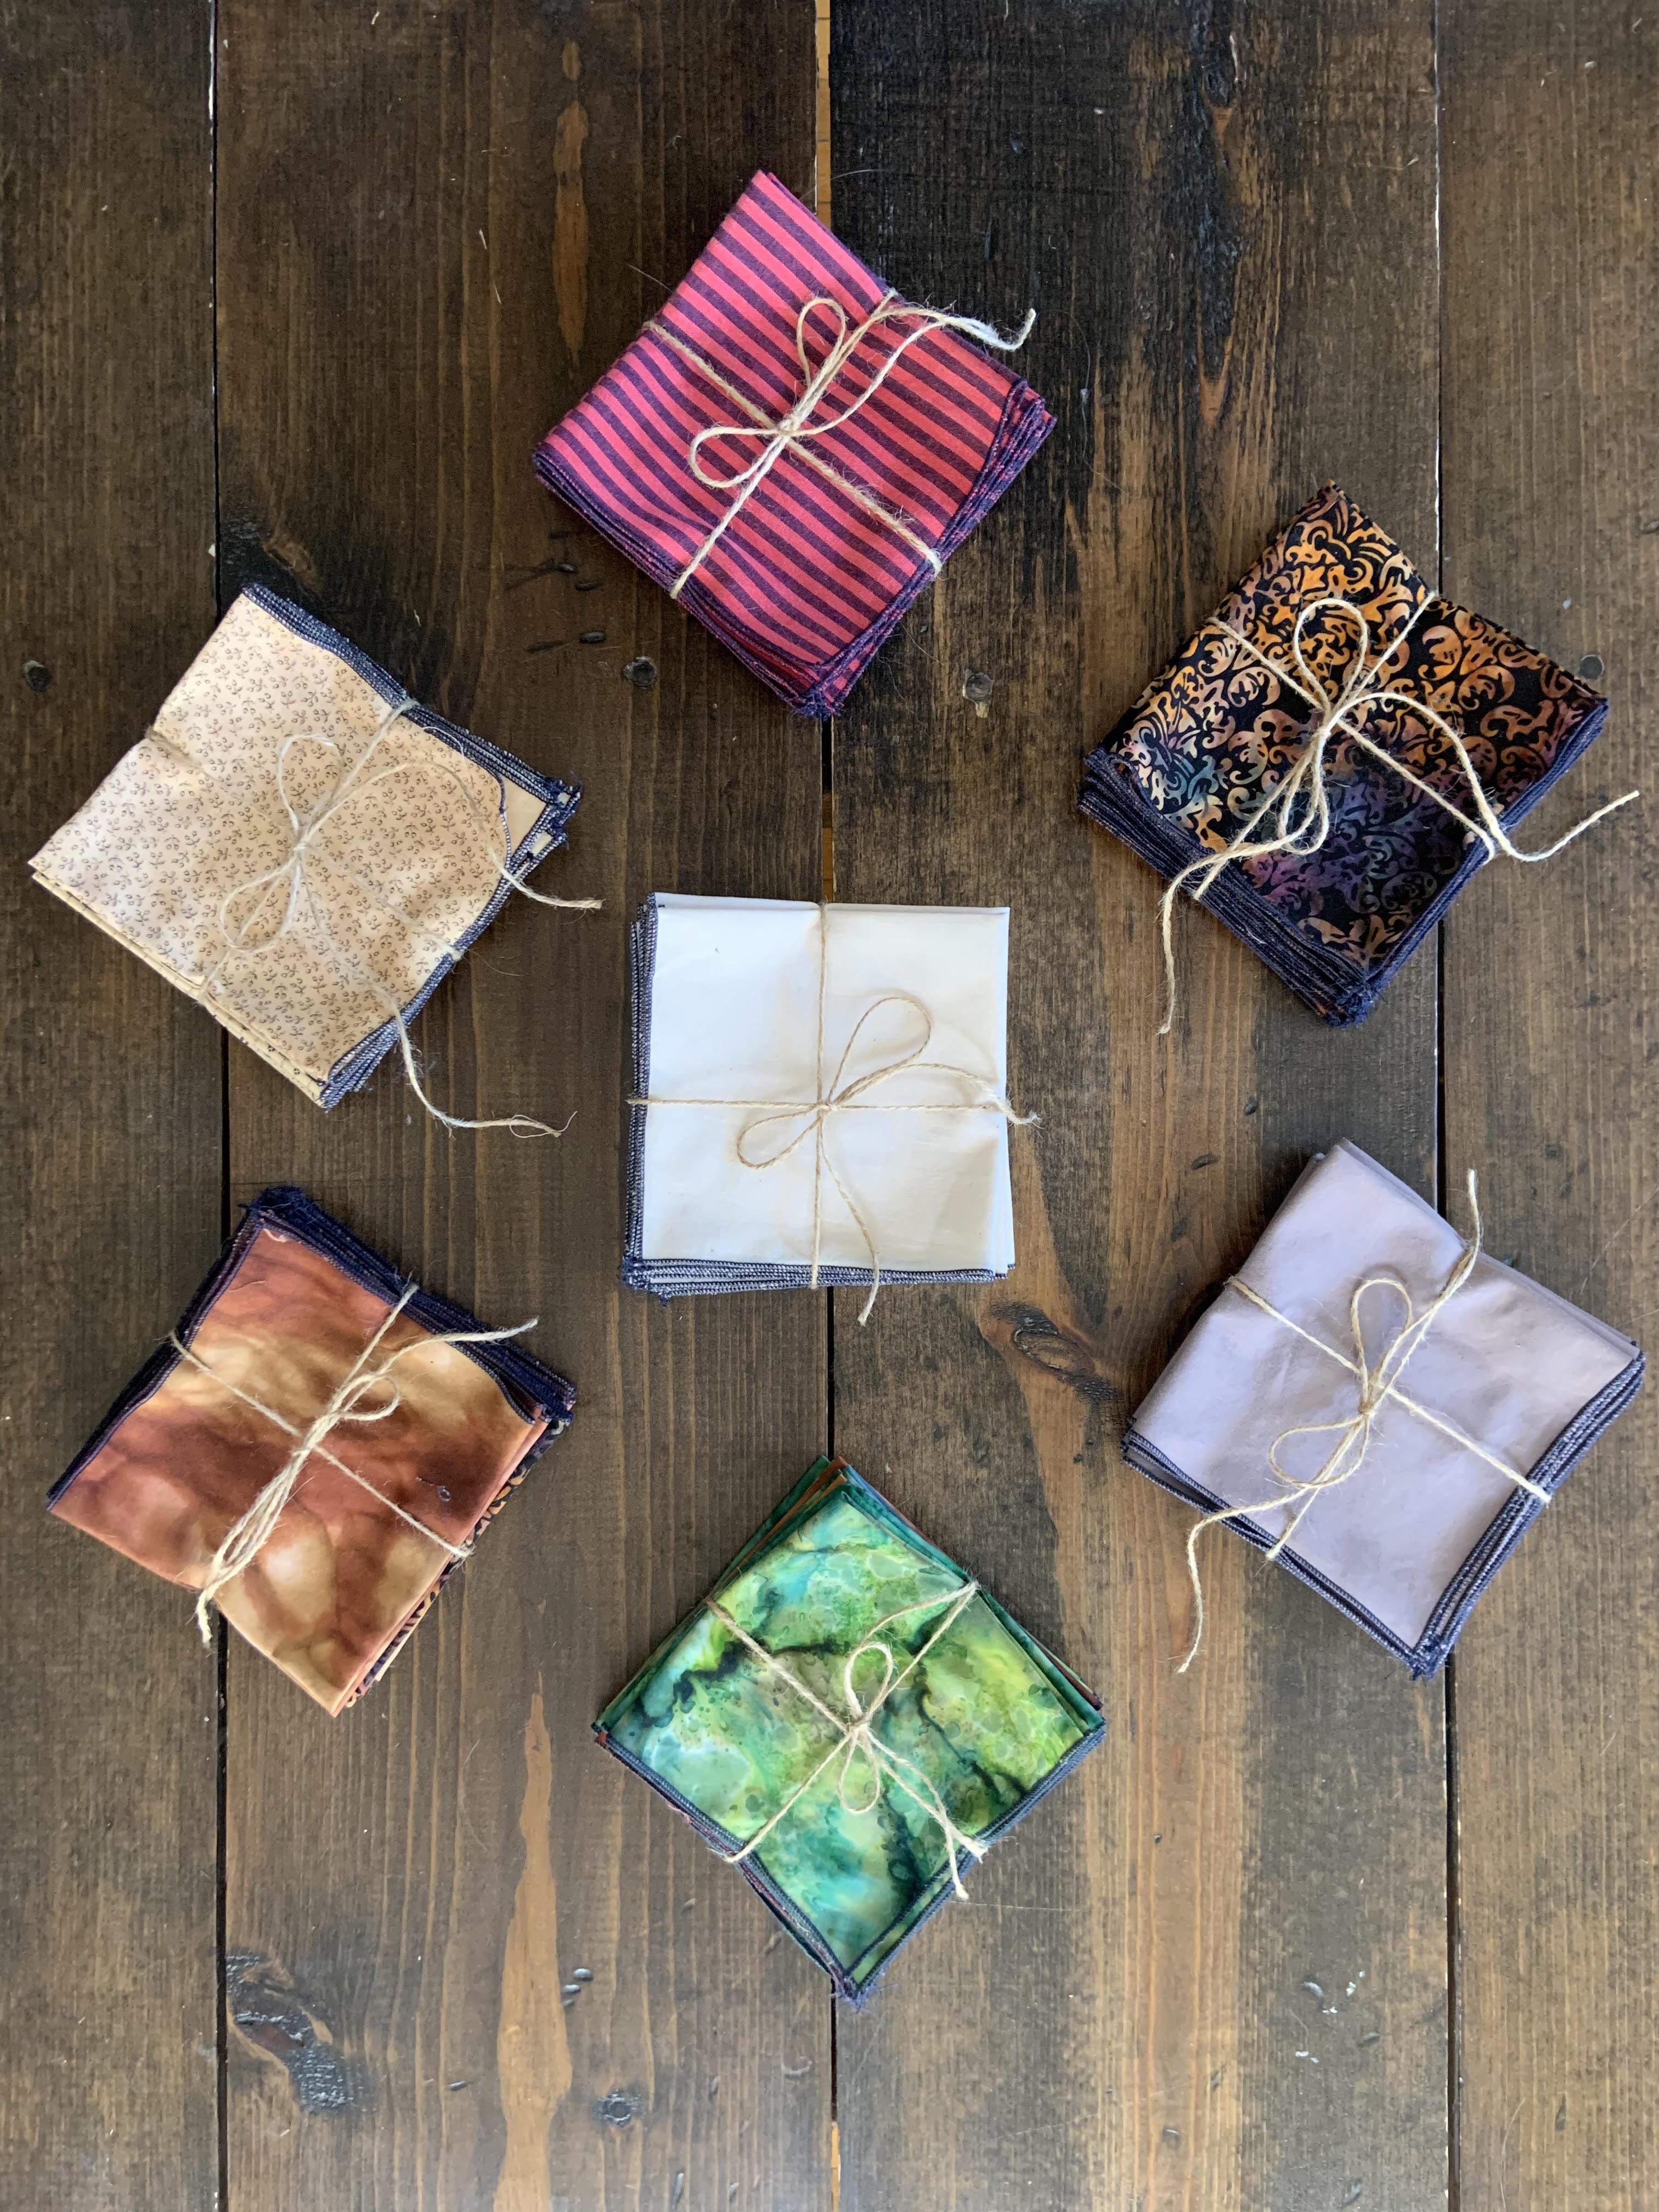 7 sets of cloth napkins